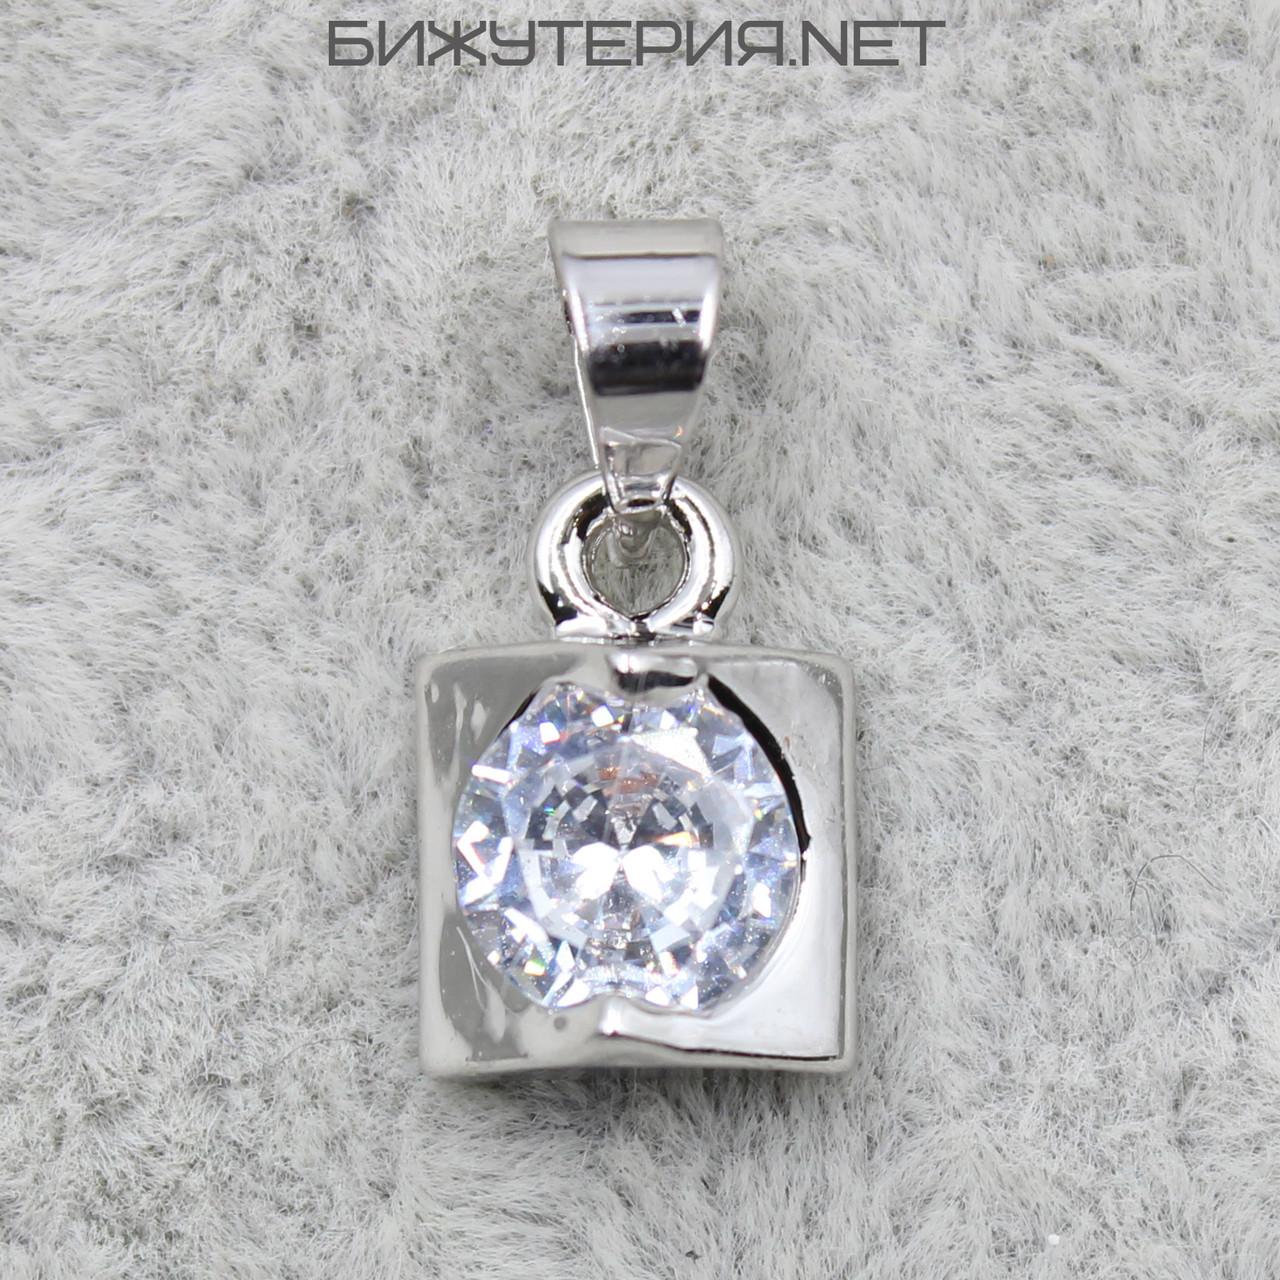 Кулон женский Stainless Steel с кристаллом цвет металла белое золото - 1063360091